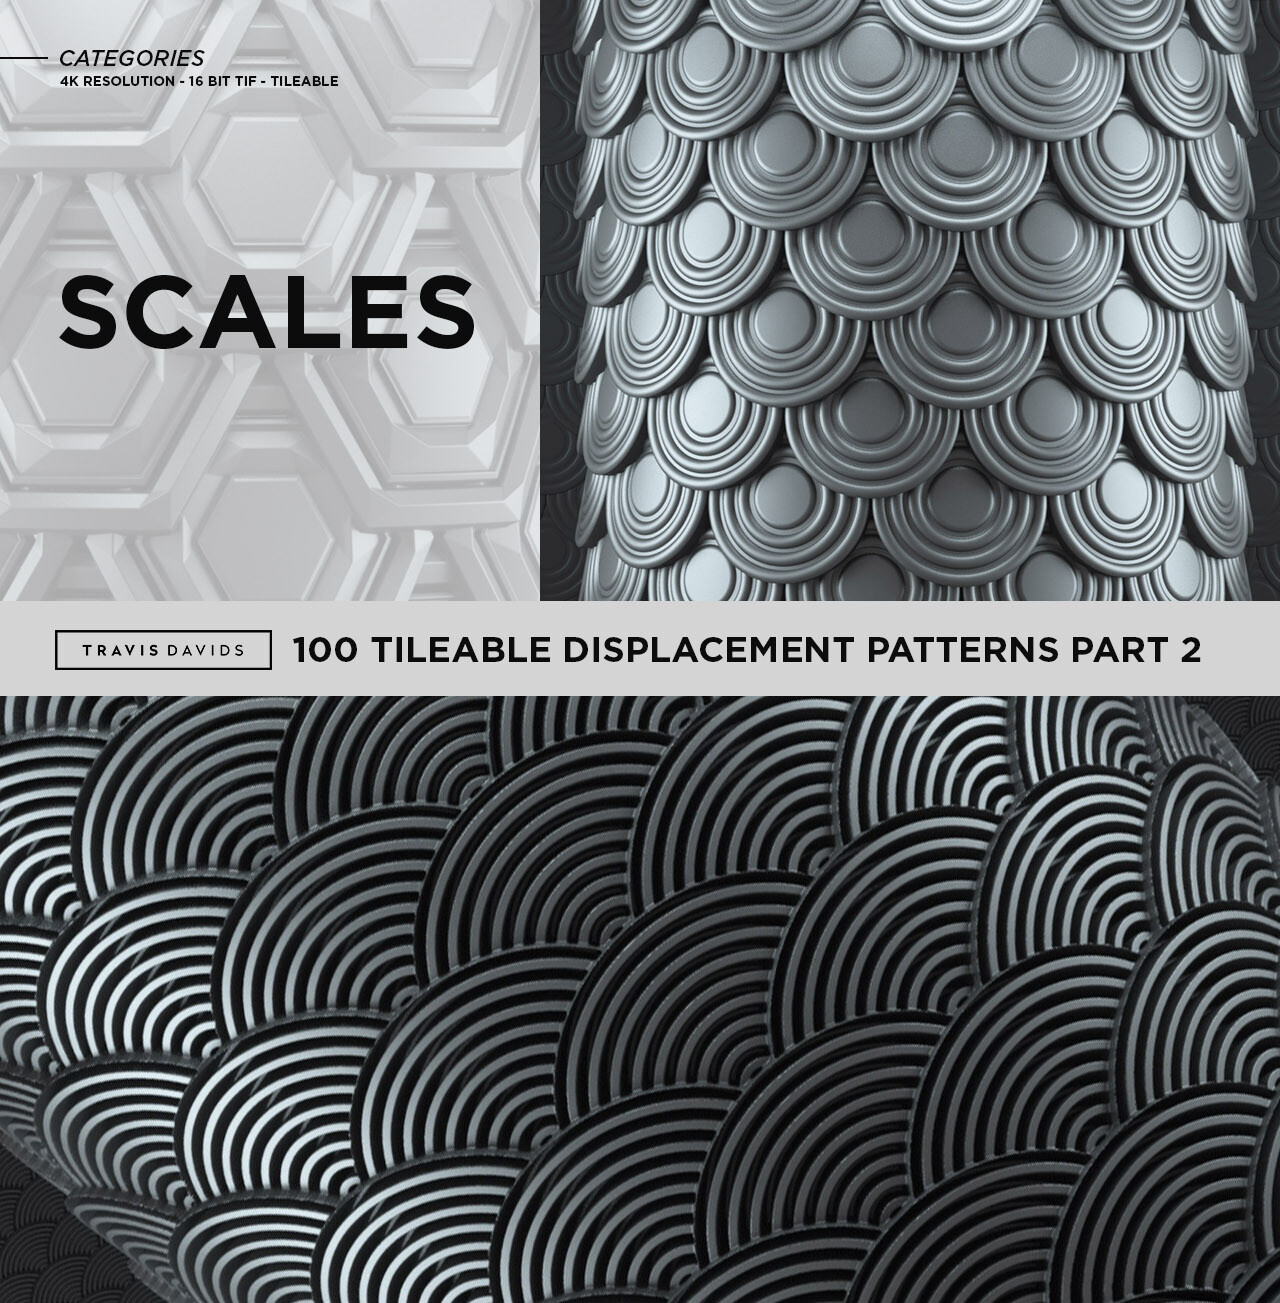 Travis davids categories scales